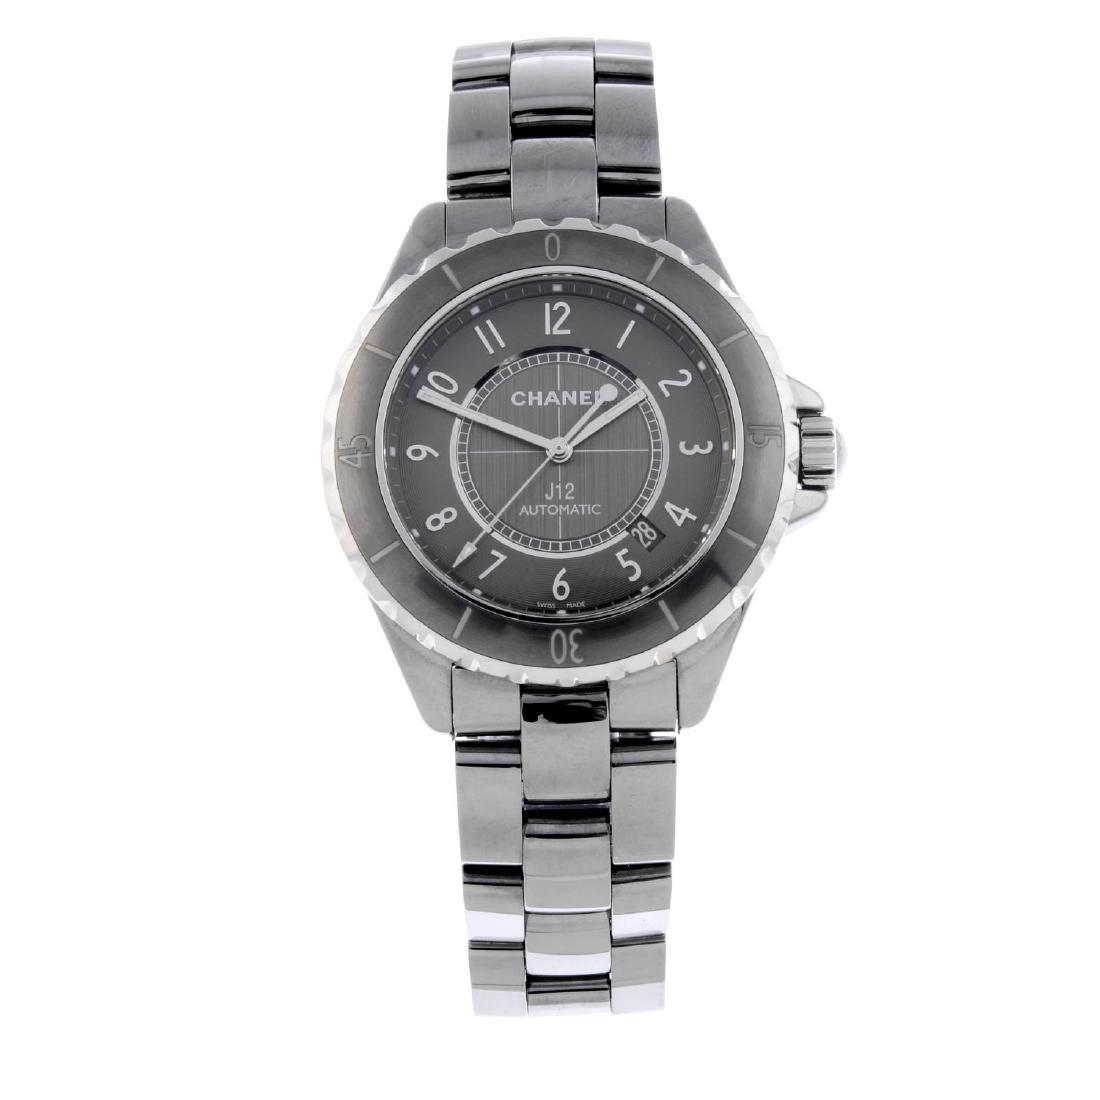 CHANEL - a J12 bracelet watch. Ceramic case with